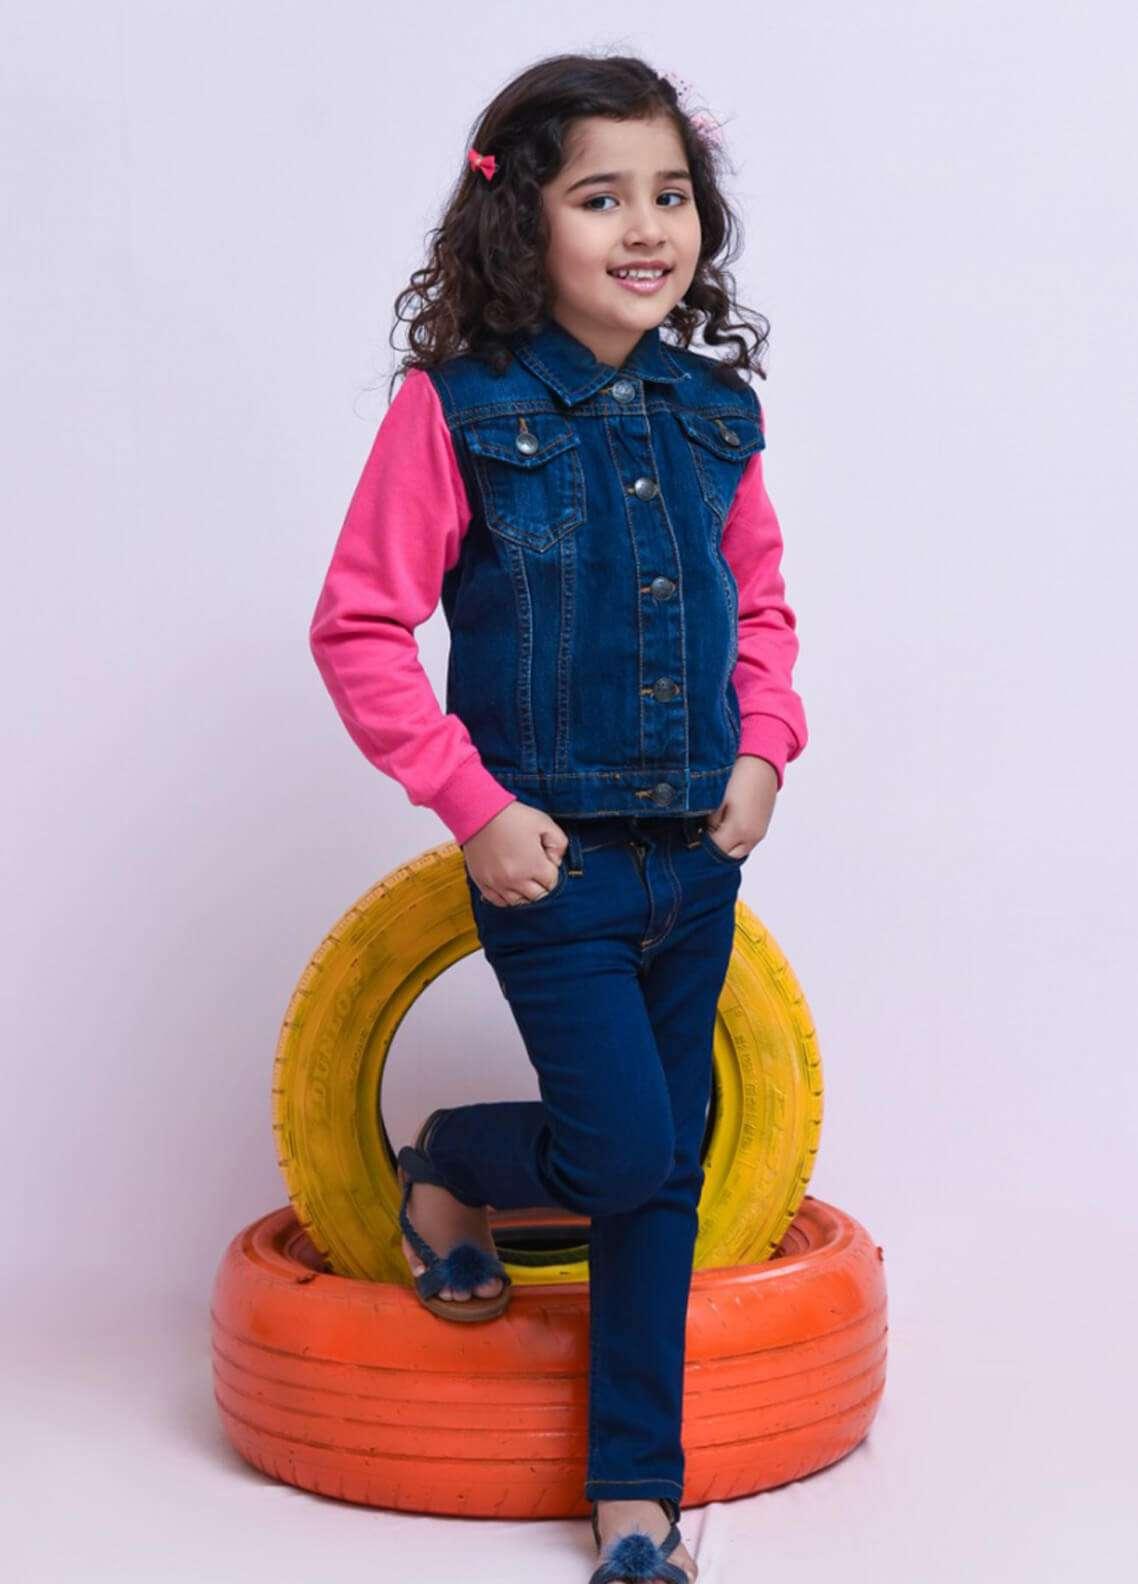 Ochre Denim Textured Jackets for Girls - Blue OJD 01